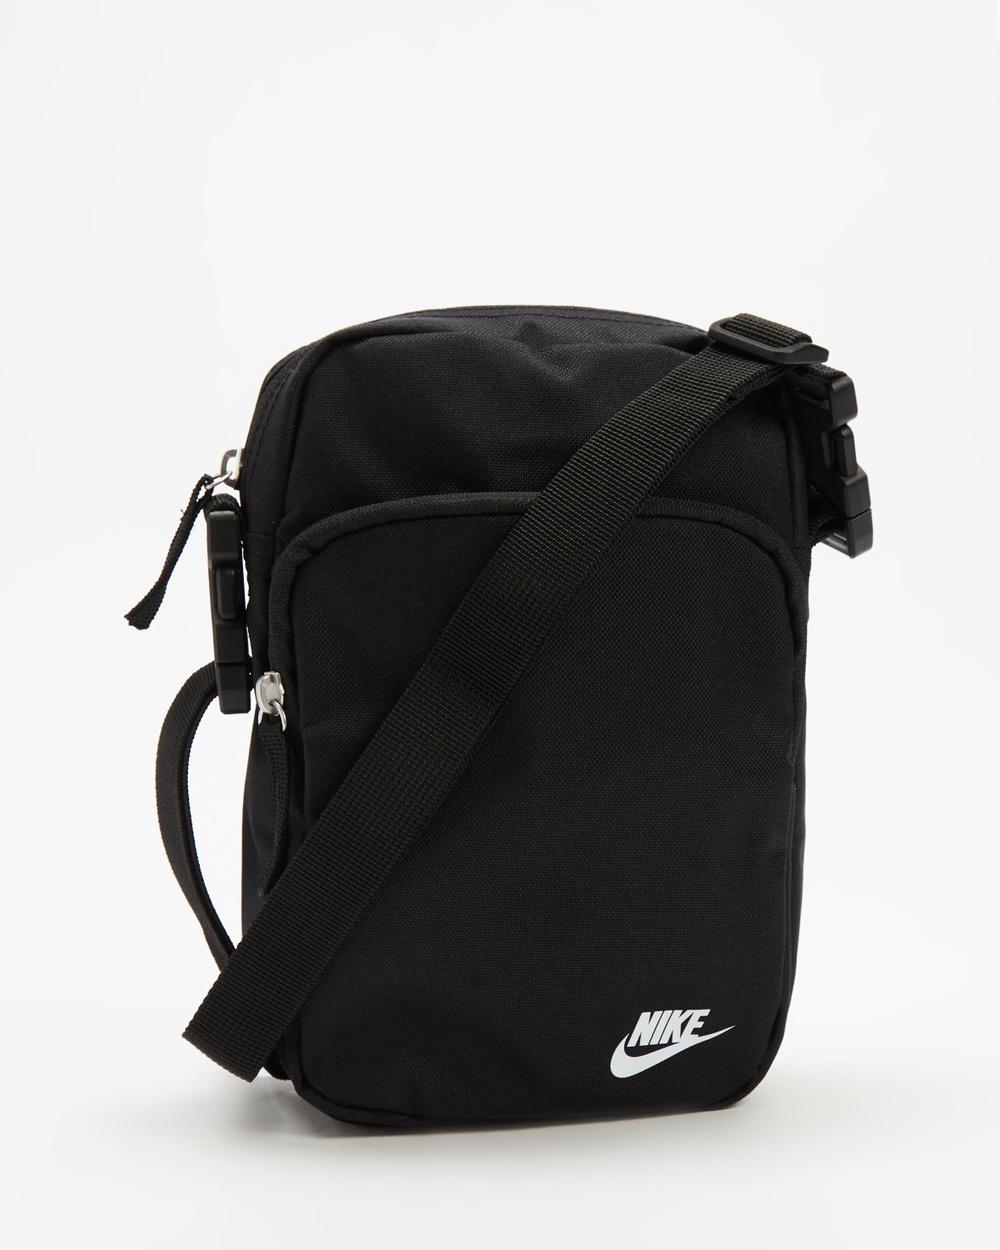 Nike Heritage Crossbody Bags Black & White